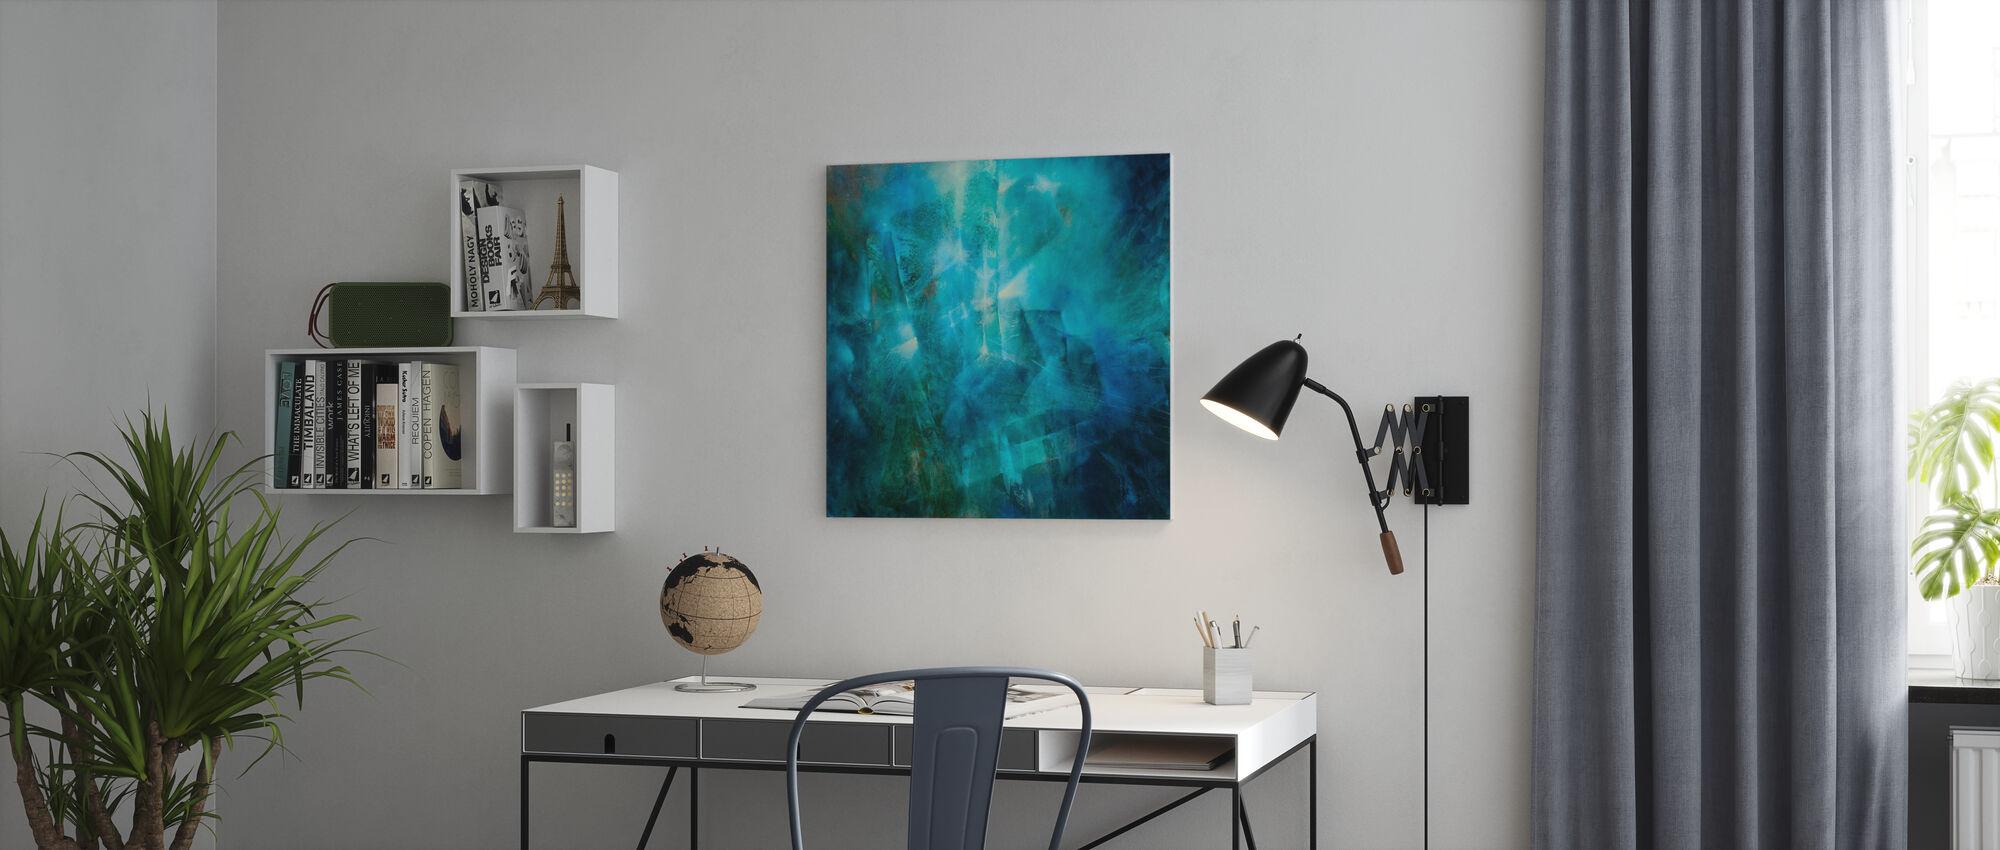 Emerald II - Canvas print - Office